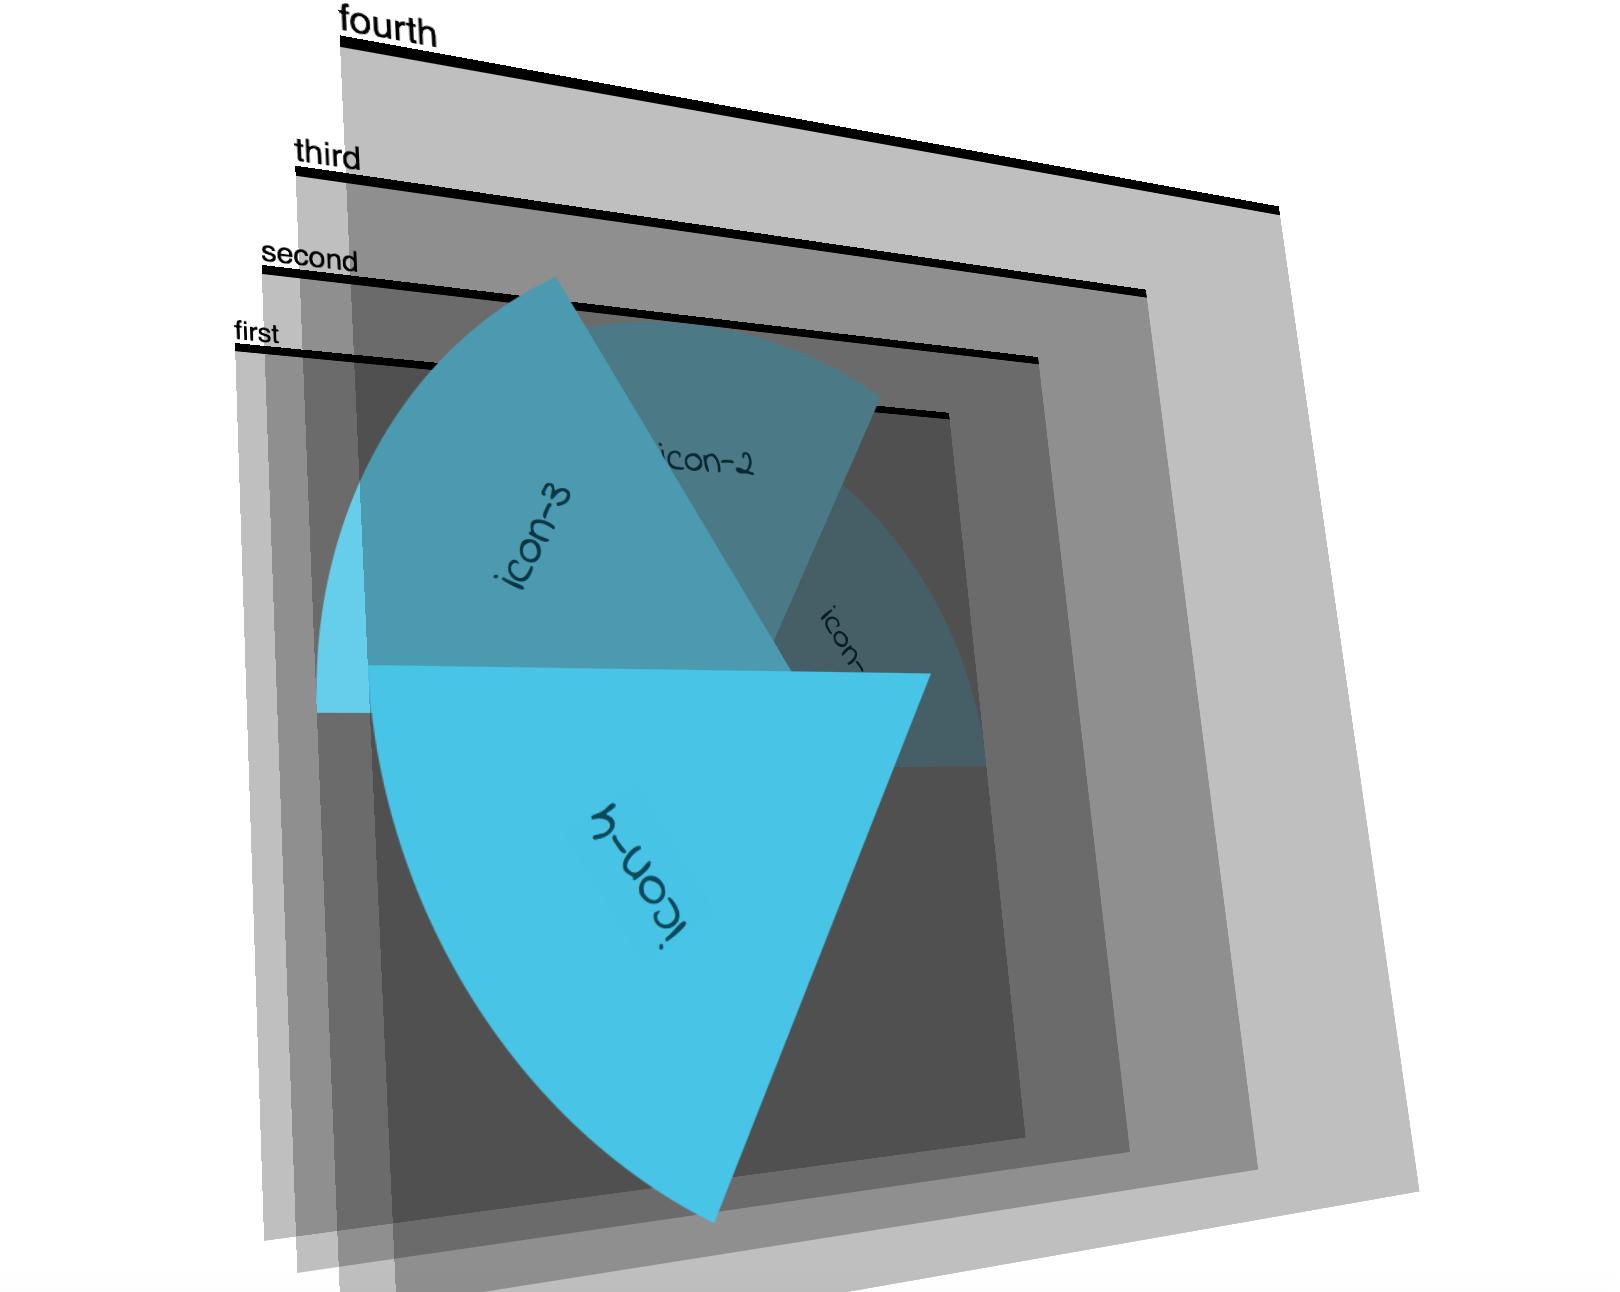 Building A Circular Navigation with CSS Clip Paths   CSS-Tricks